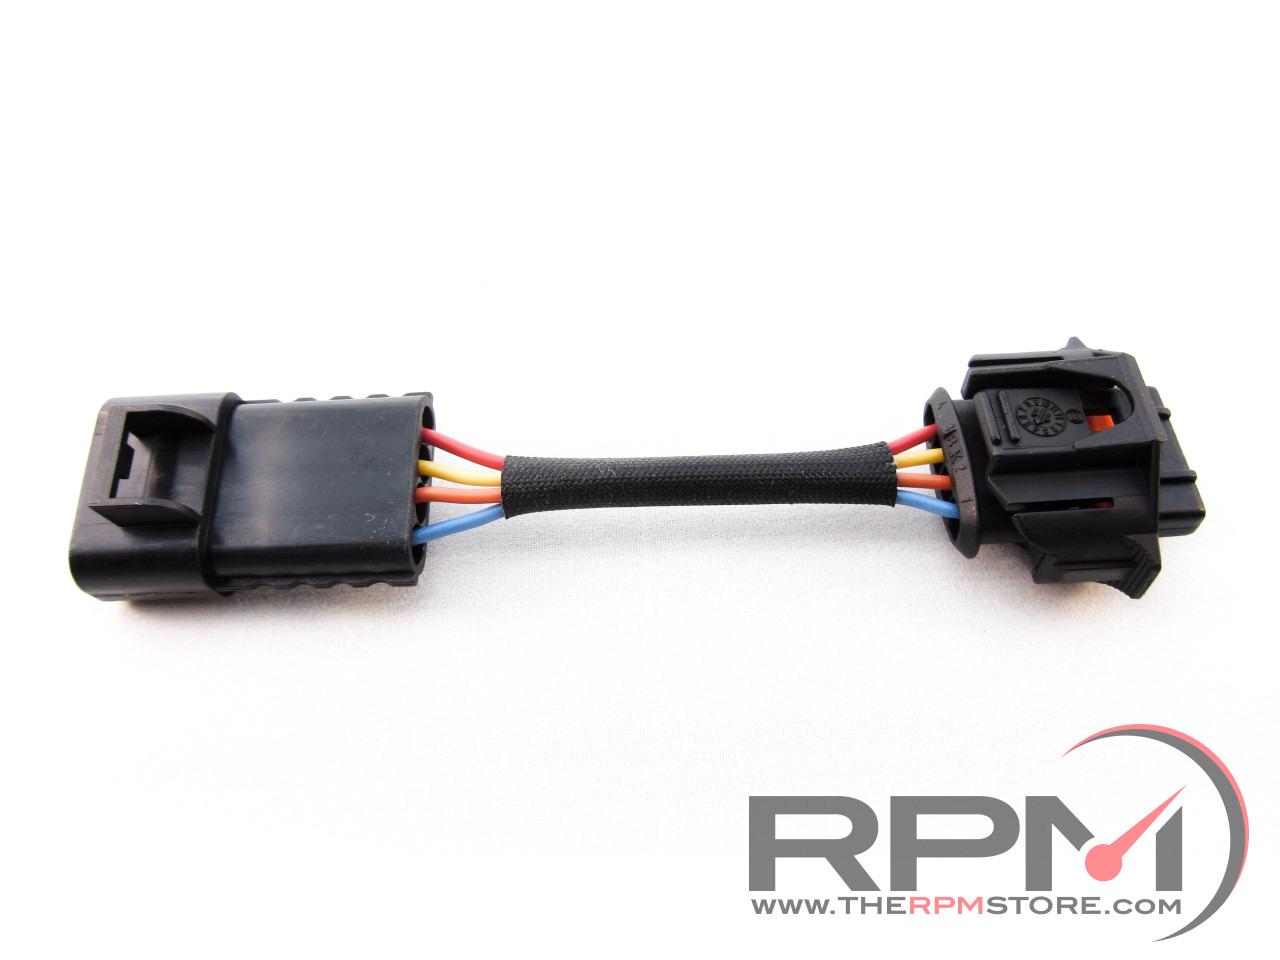 rpm bosch map sensor adapter harness for mazdaspeed 3 6 cx 7 rpm mappnp revolution